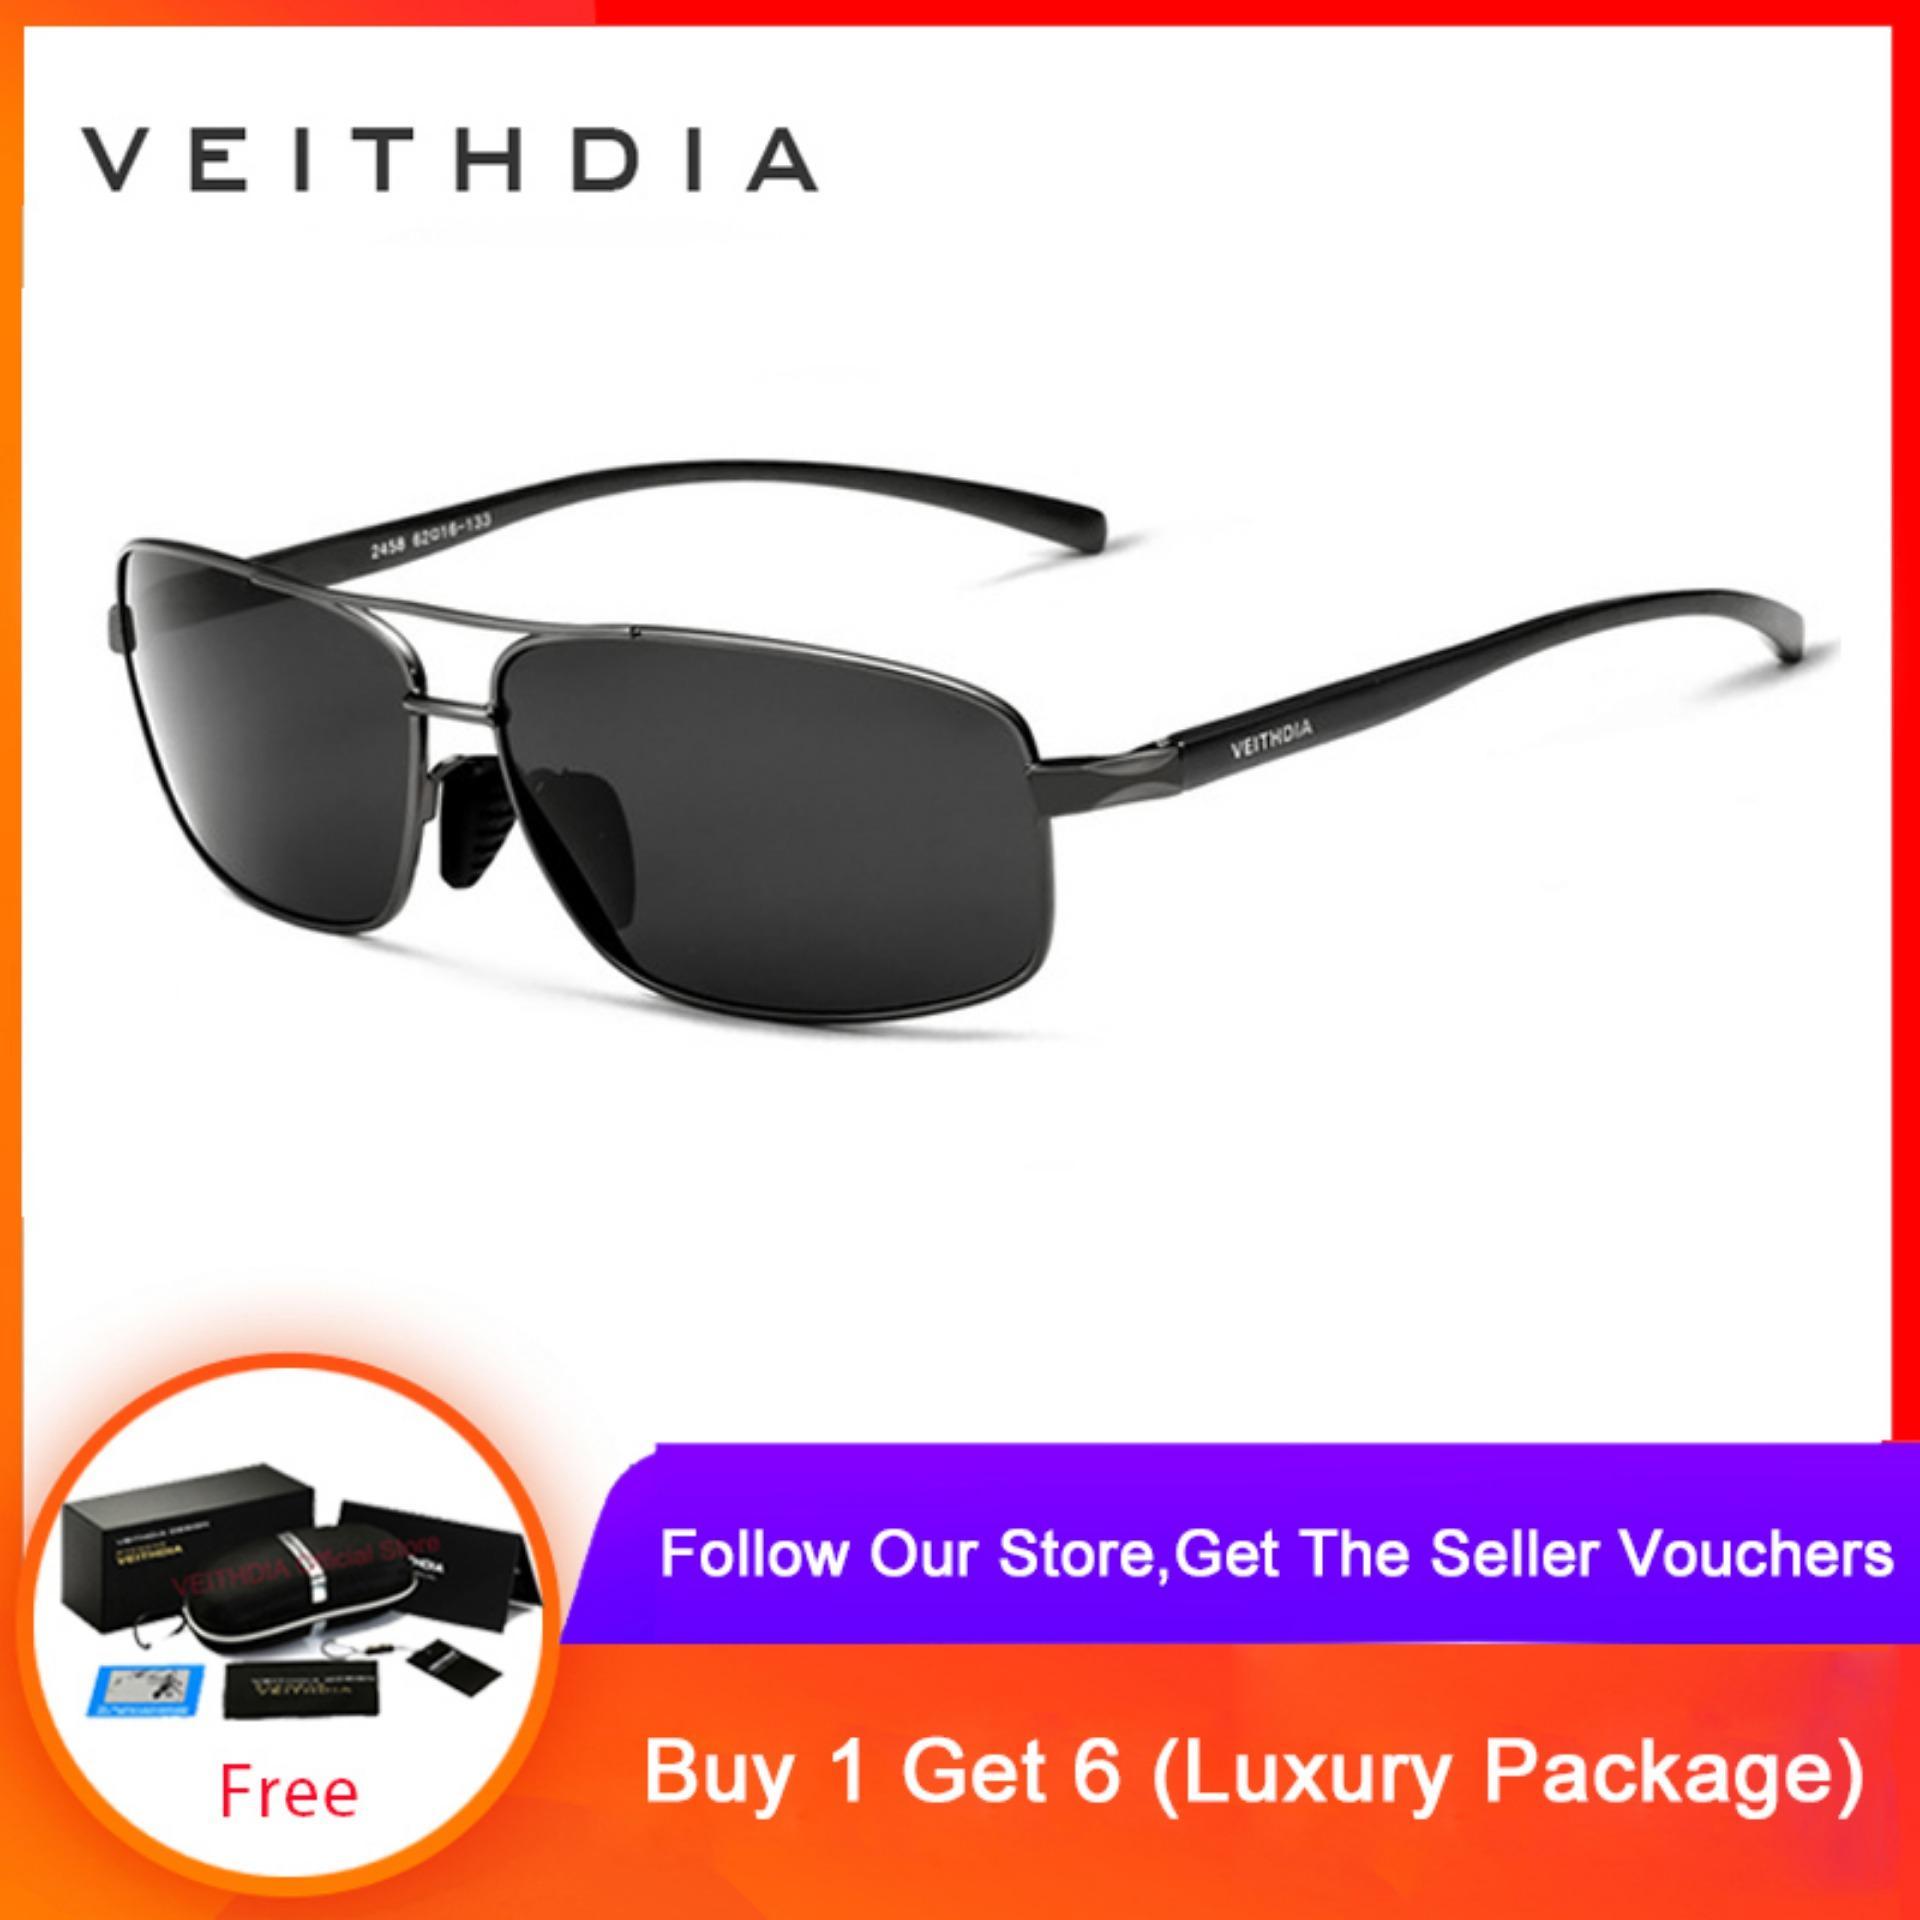 VEITHDIA Brand New Polarized Mens Sunglasses Aluminum Frame Sun Glasses Driving Eyewear Accessories For Men oculos de sol masculino 2458(Grey)...